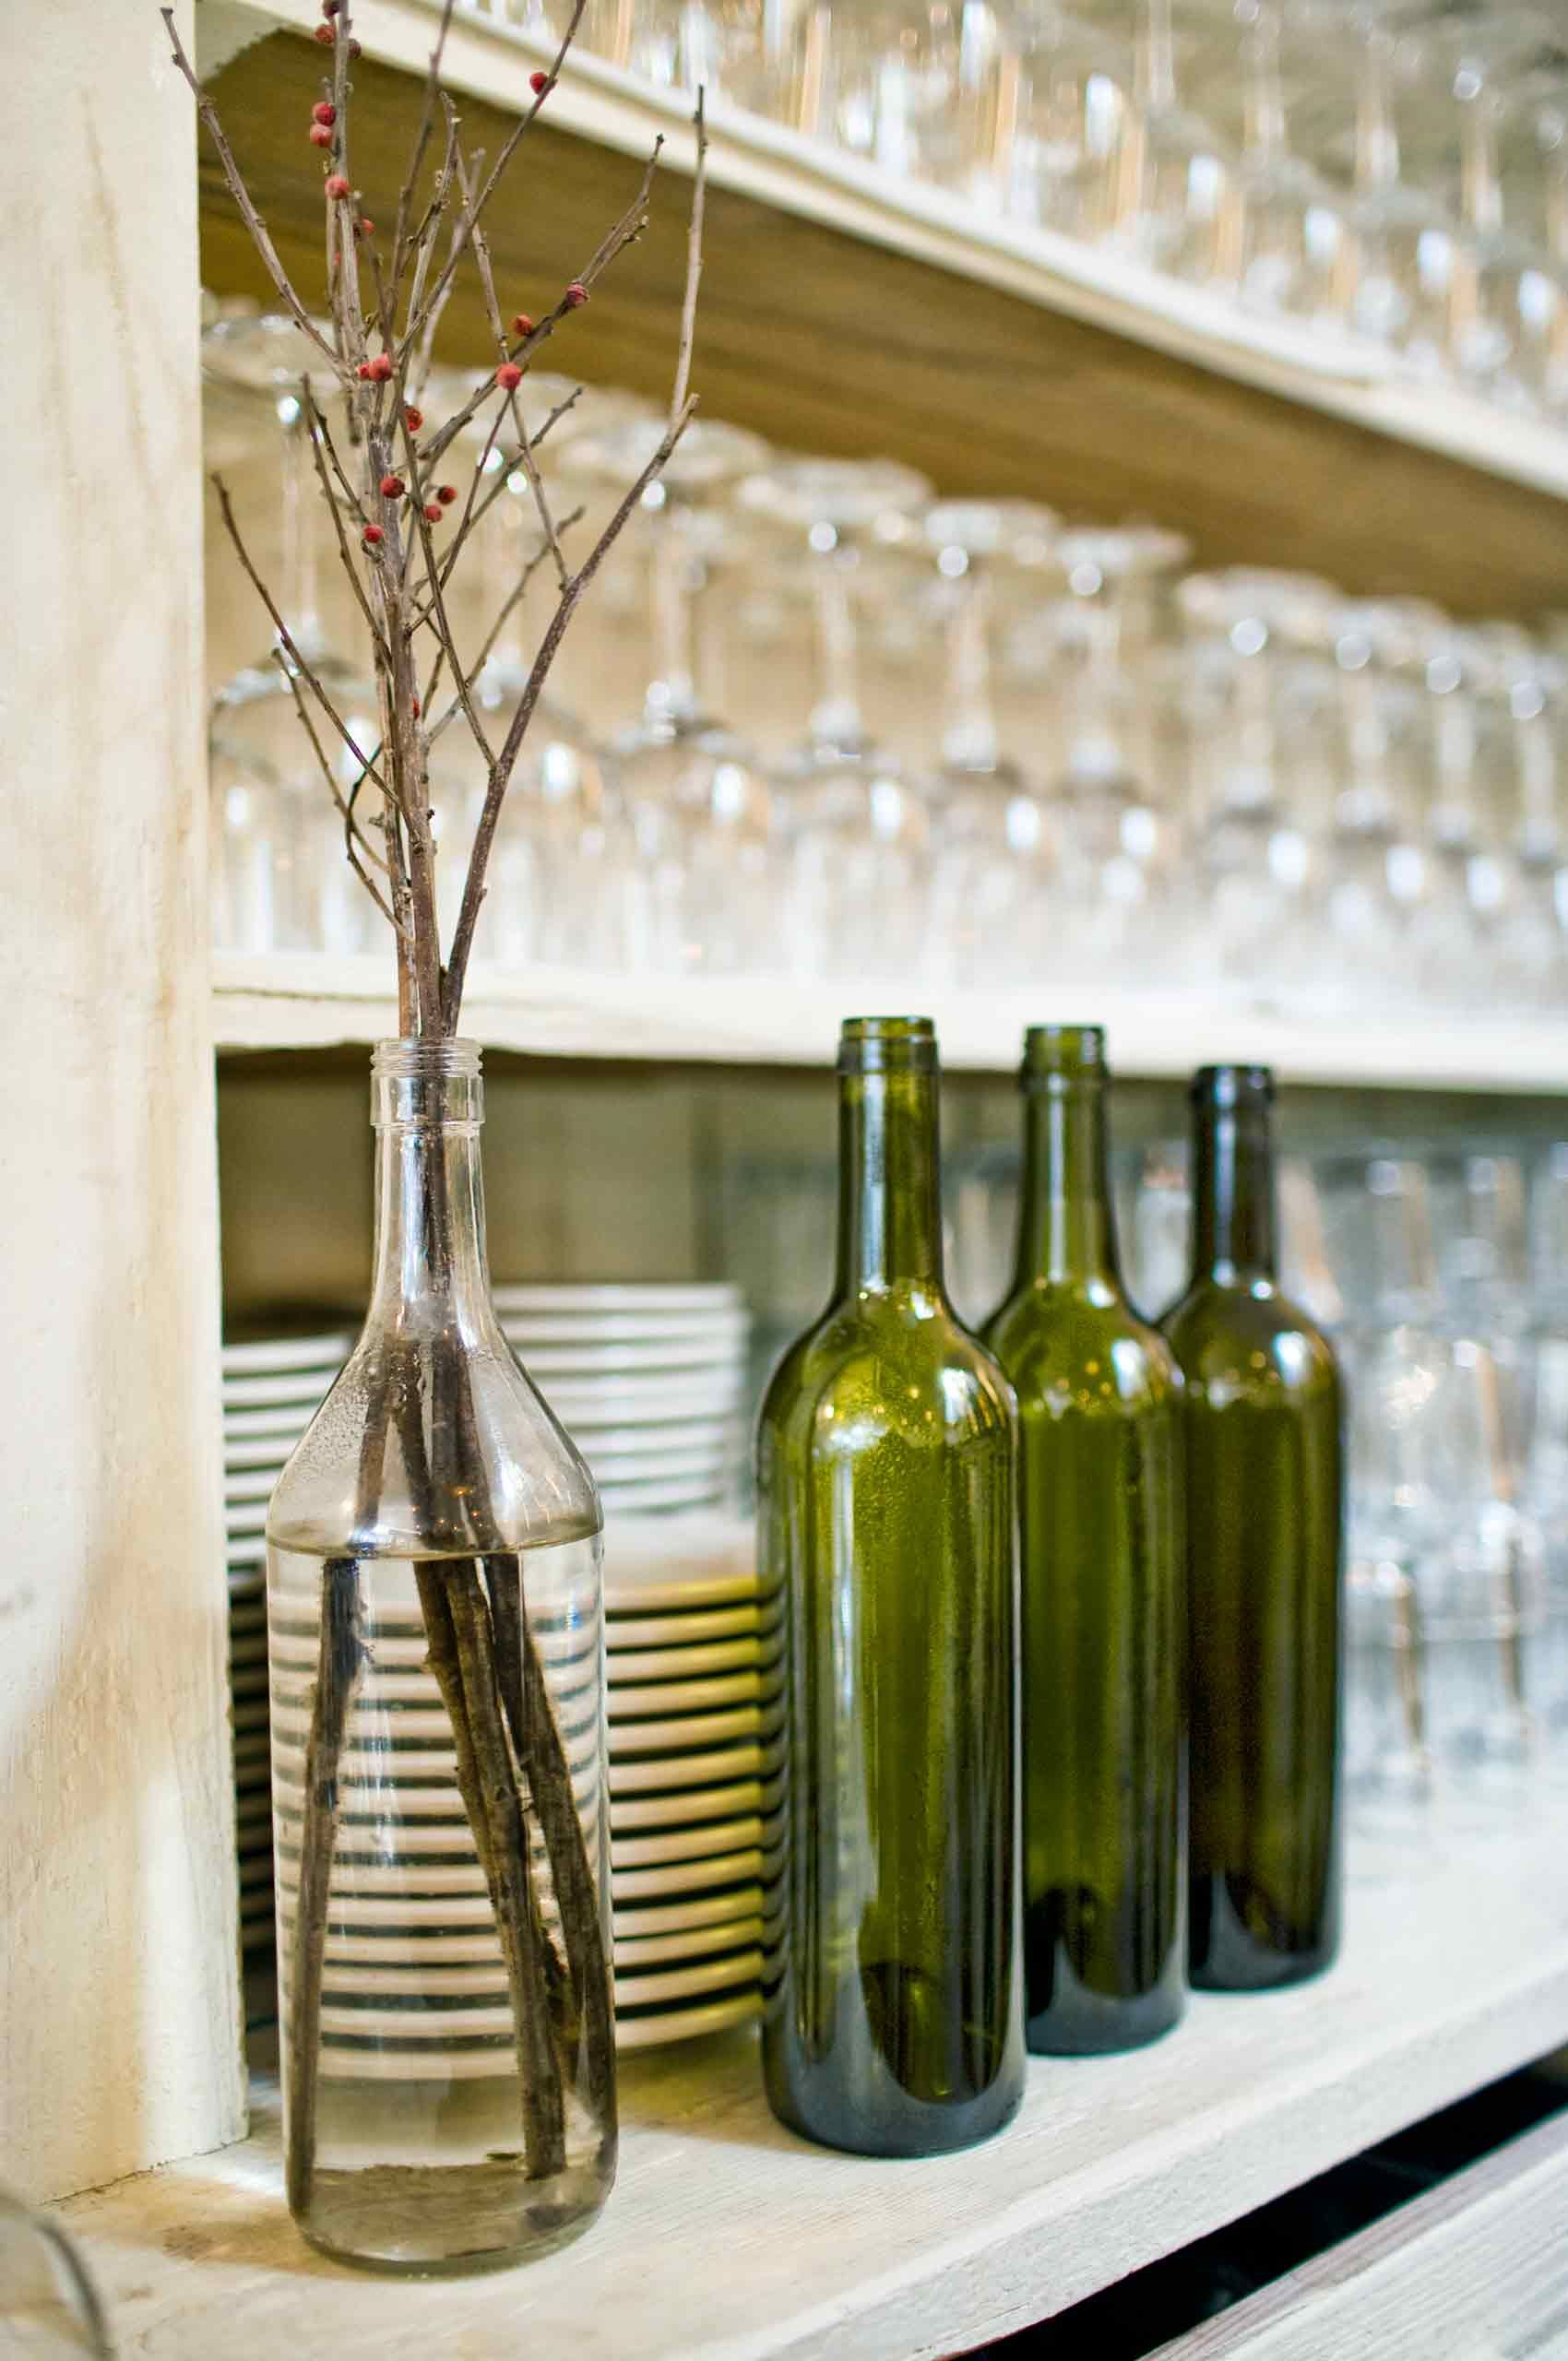 Bottles-and-twigs-Restaurant-InteriorDetail-by-HenrikOlundPhotography..jpg